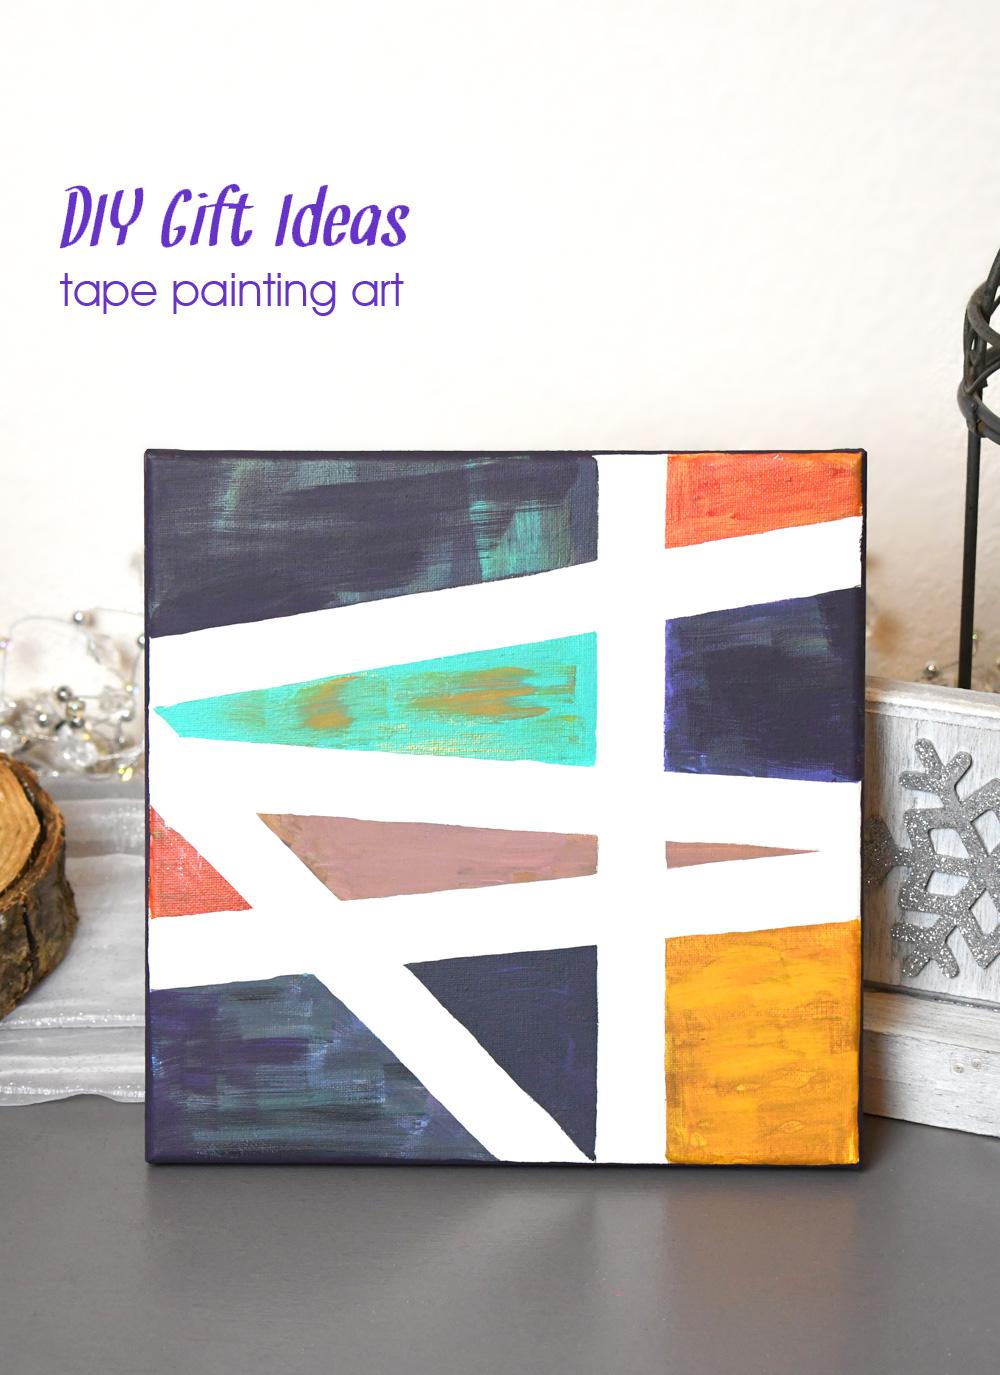 DIY gift ideas tape painting art